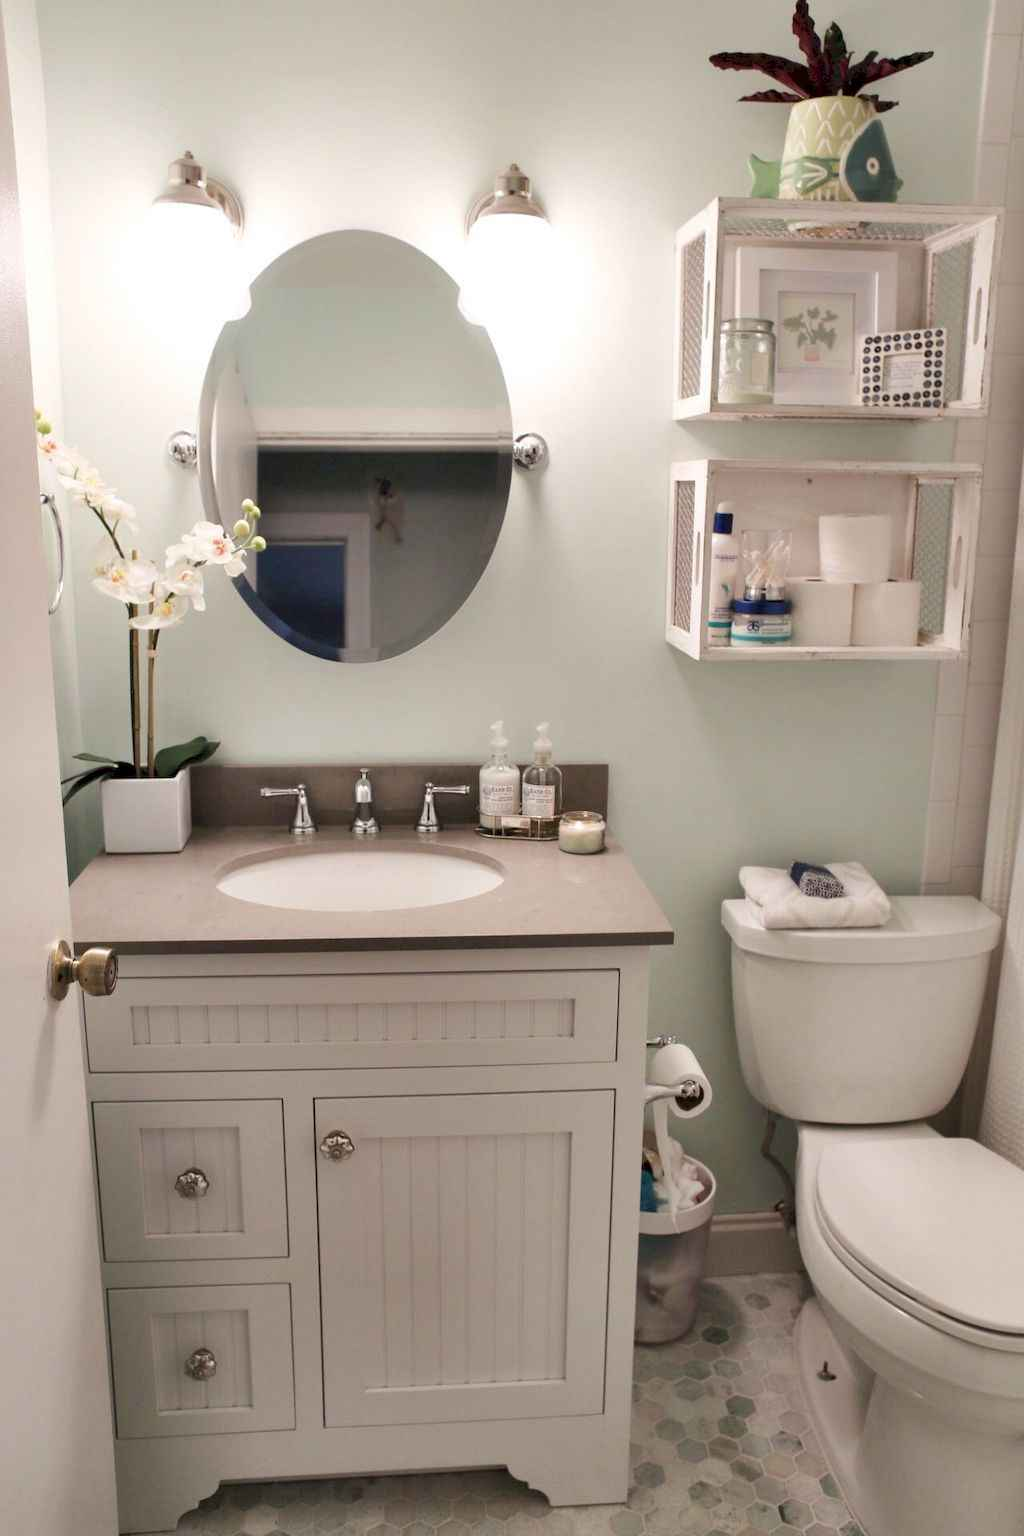 111 Brilliant Small Bathroom Remodel Ideas On A Budget (43)